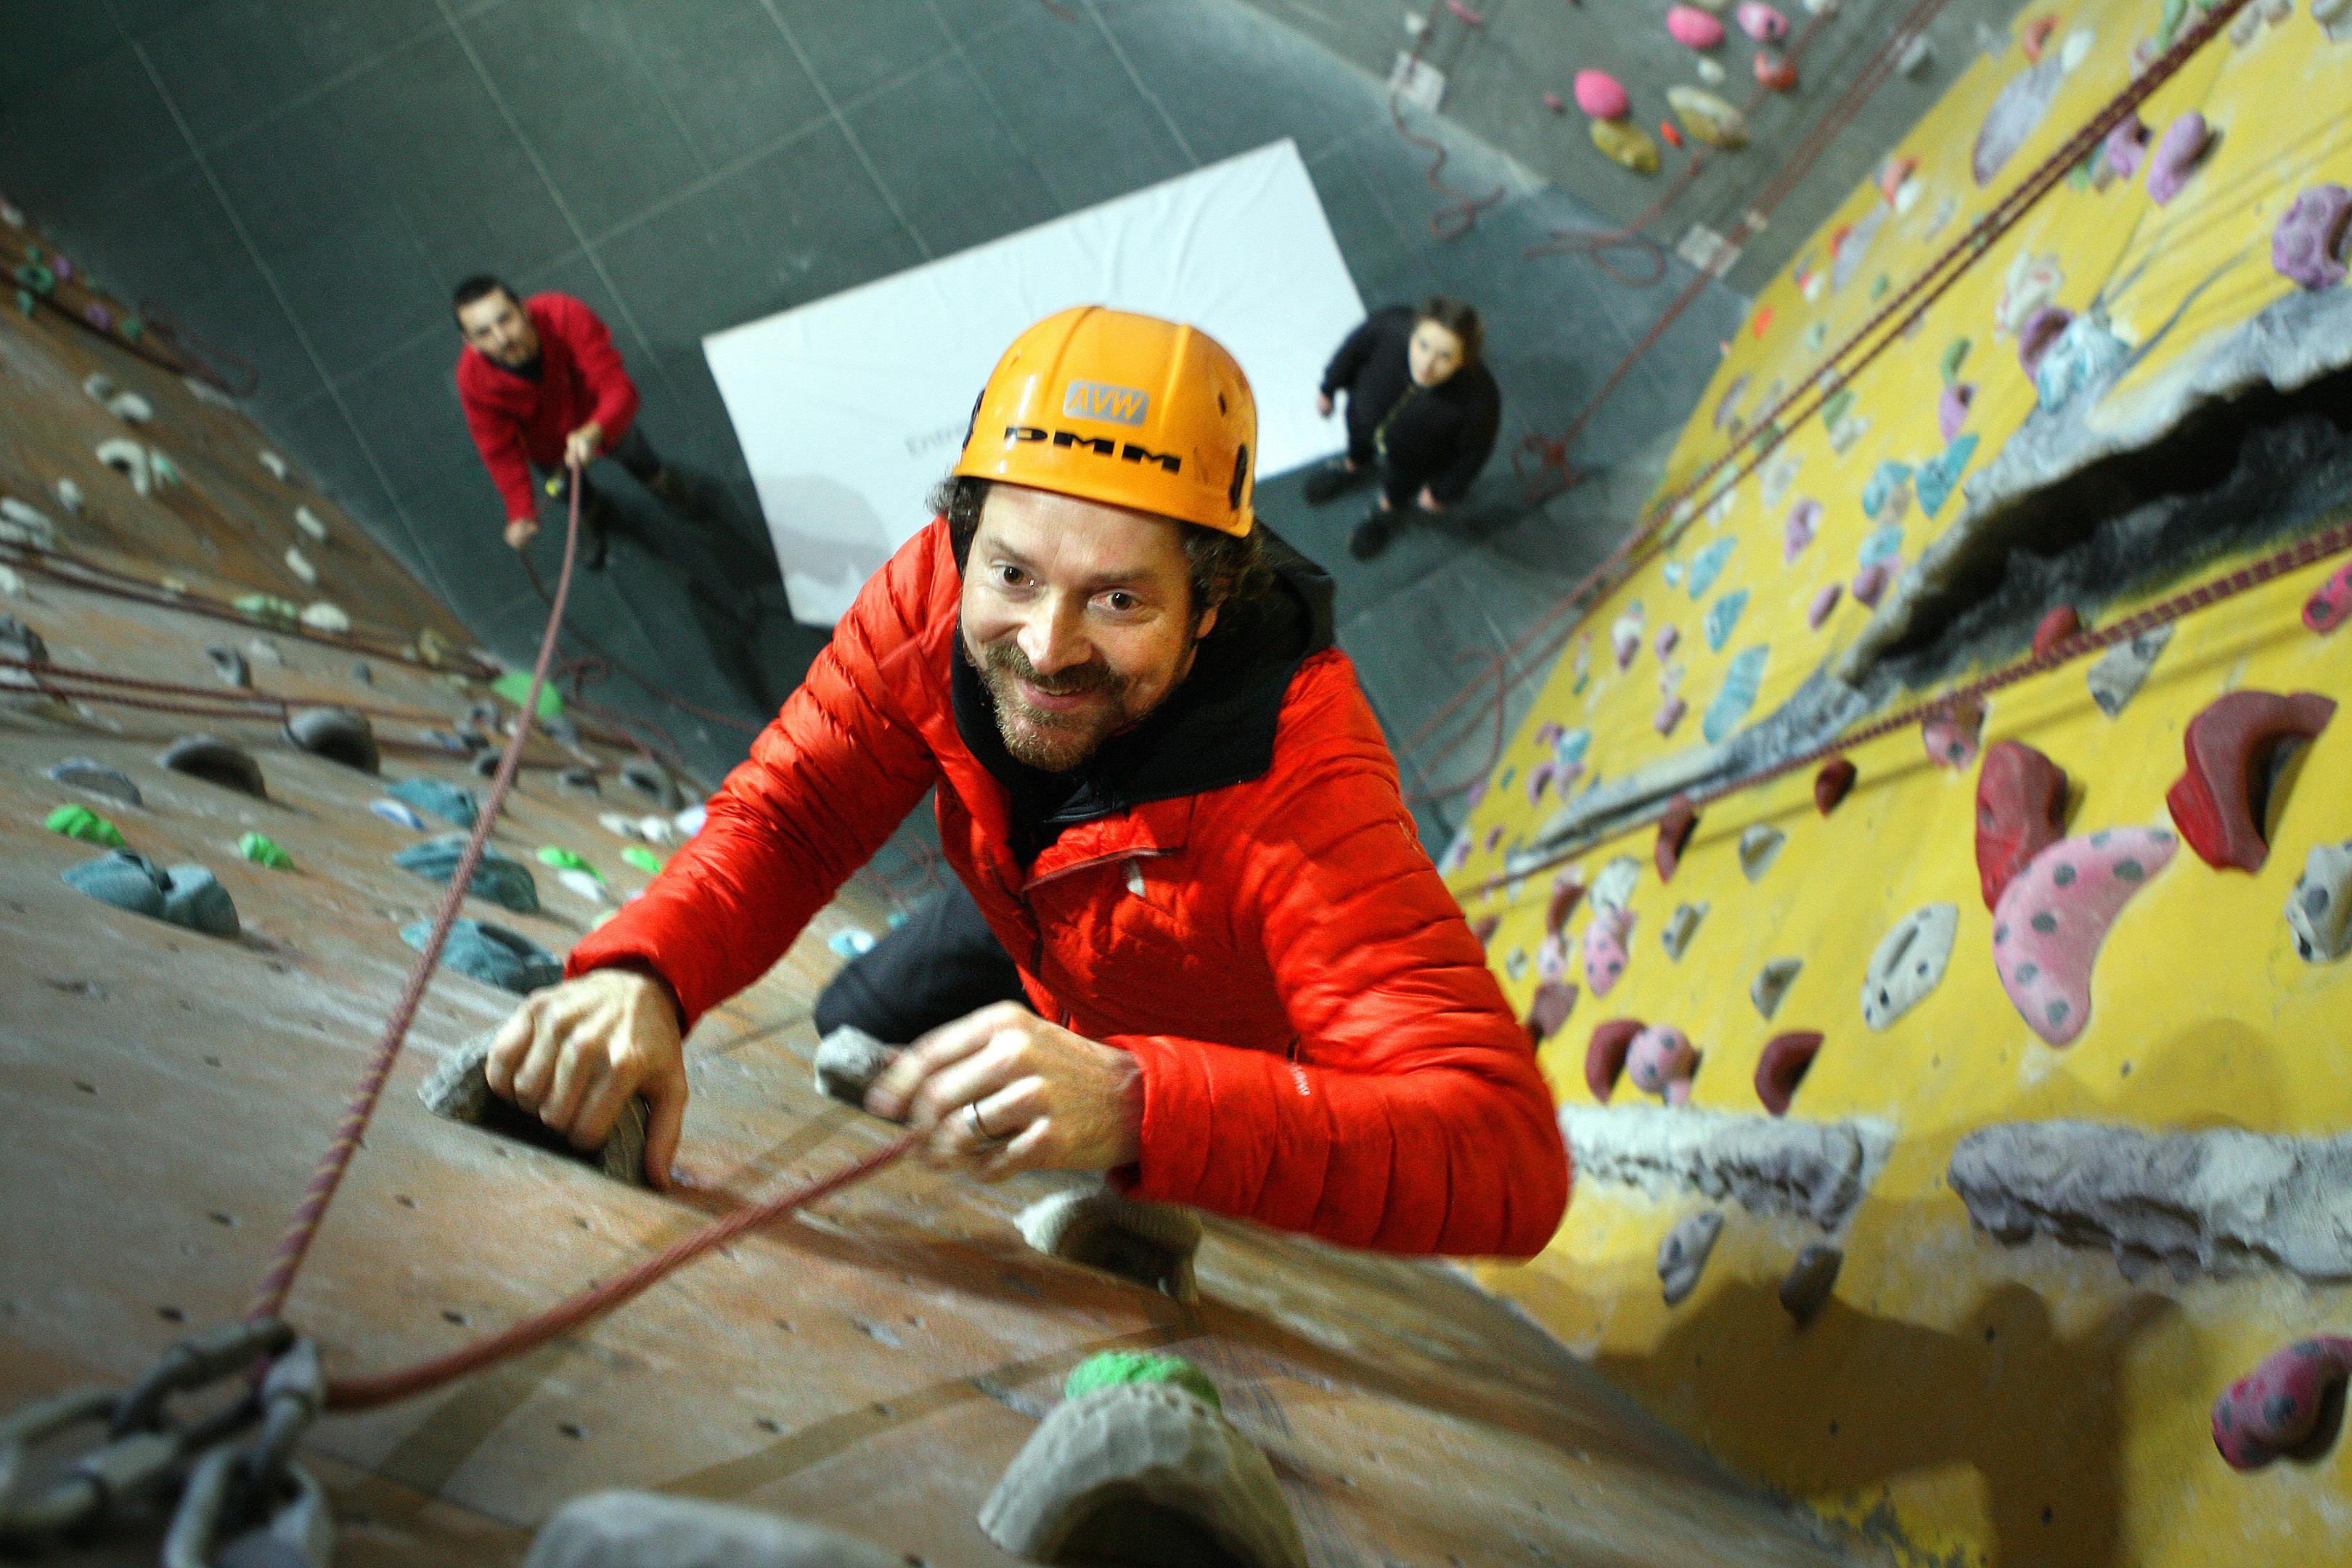 Chris van der Kuyl at Avertical World in Dundee.